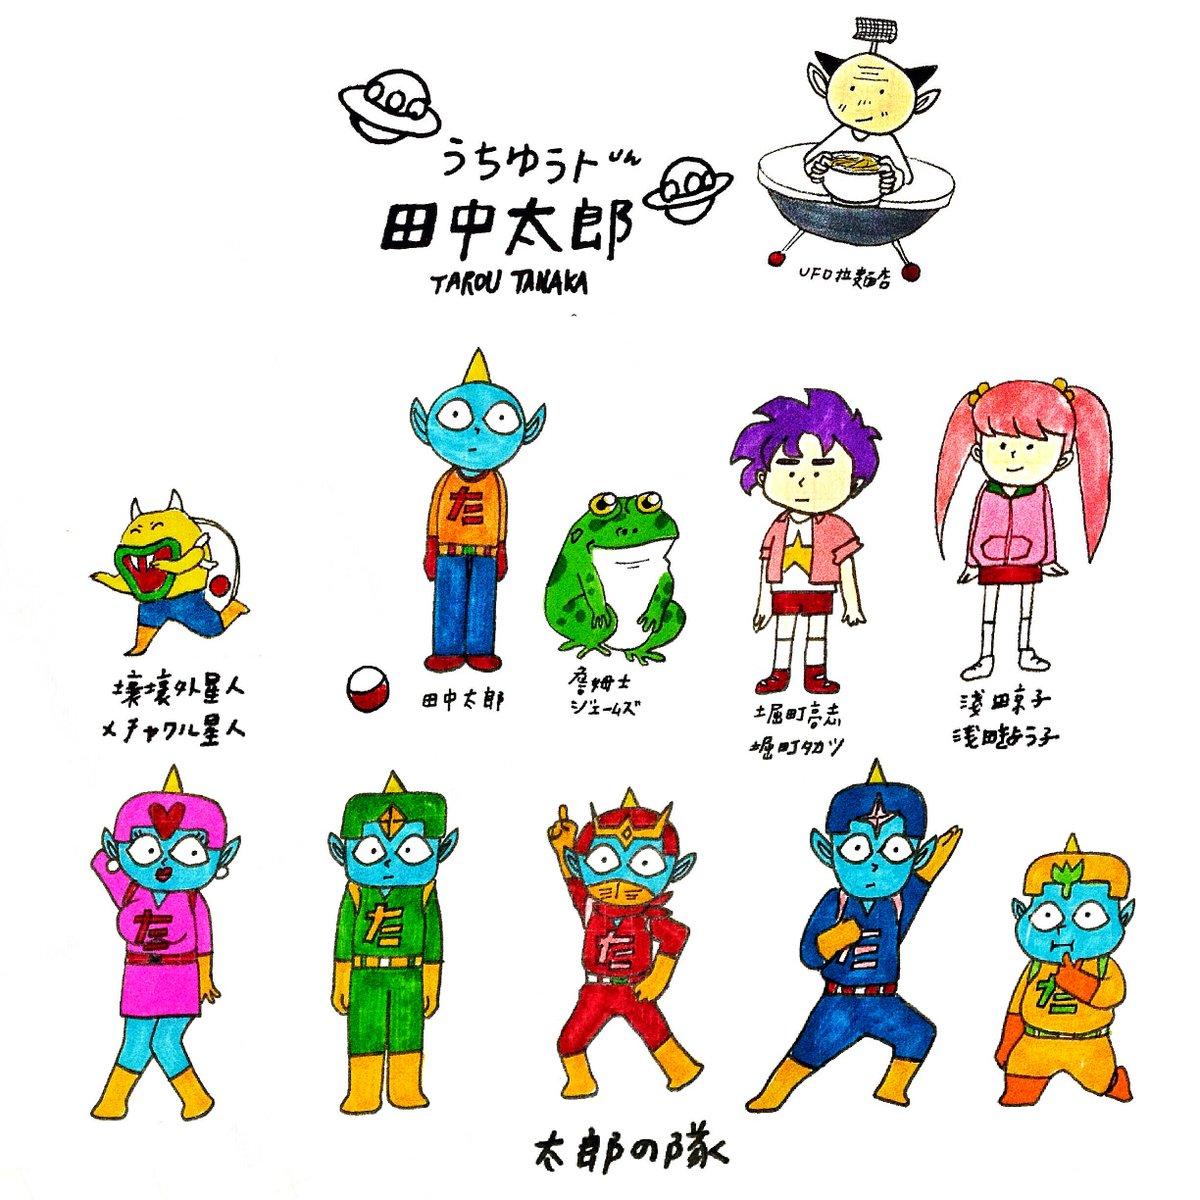 Image result for Taro Tanaka